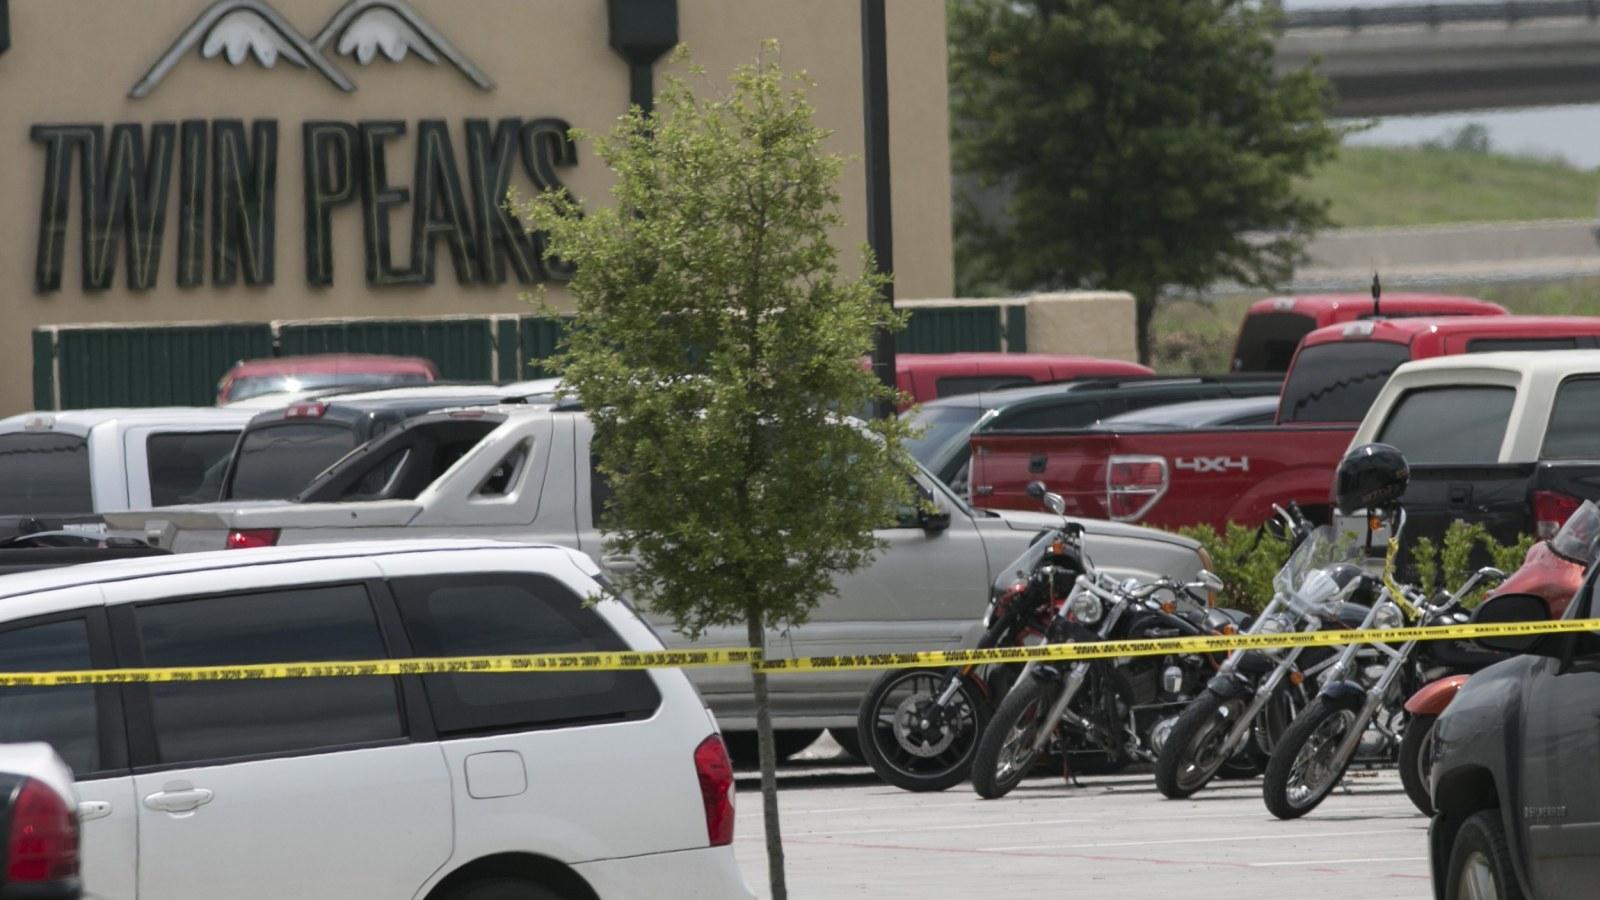 Three Biker Gang Members Held After Waco Shooting Accidentally